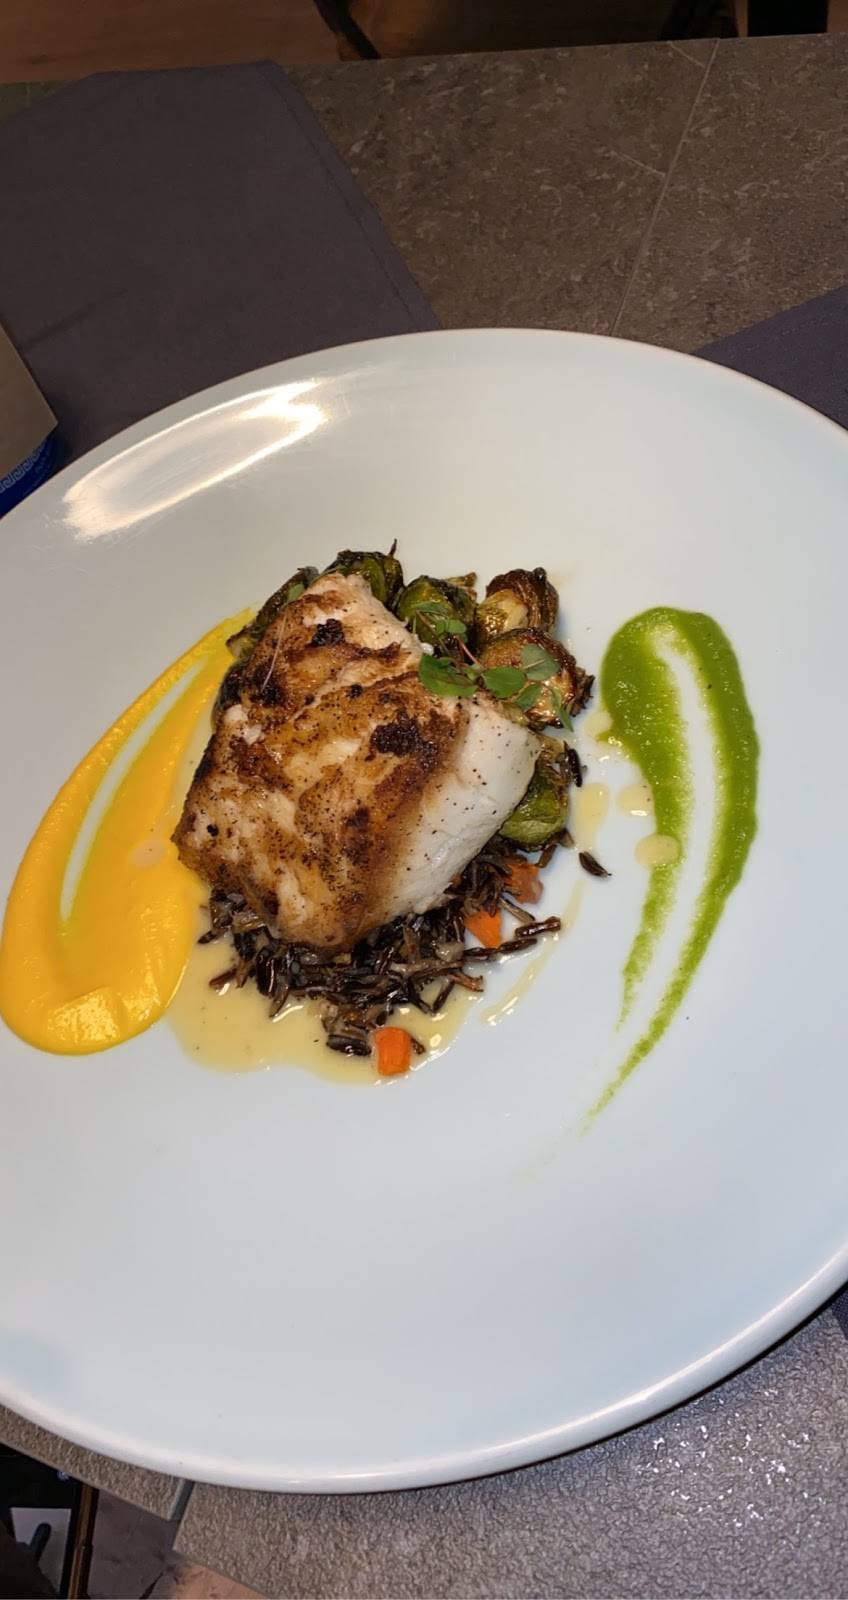 Pekarna NYC | restaurant | 594 Amsterdam Ave, New York, NY 10024, USA | 6469749070 OR +1 646-974-9070